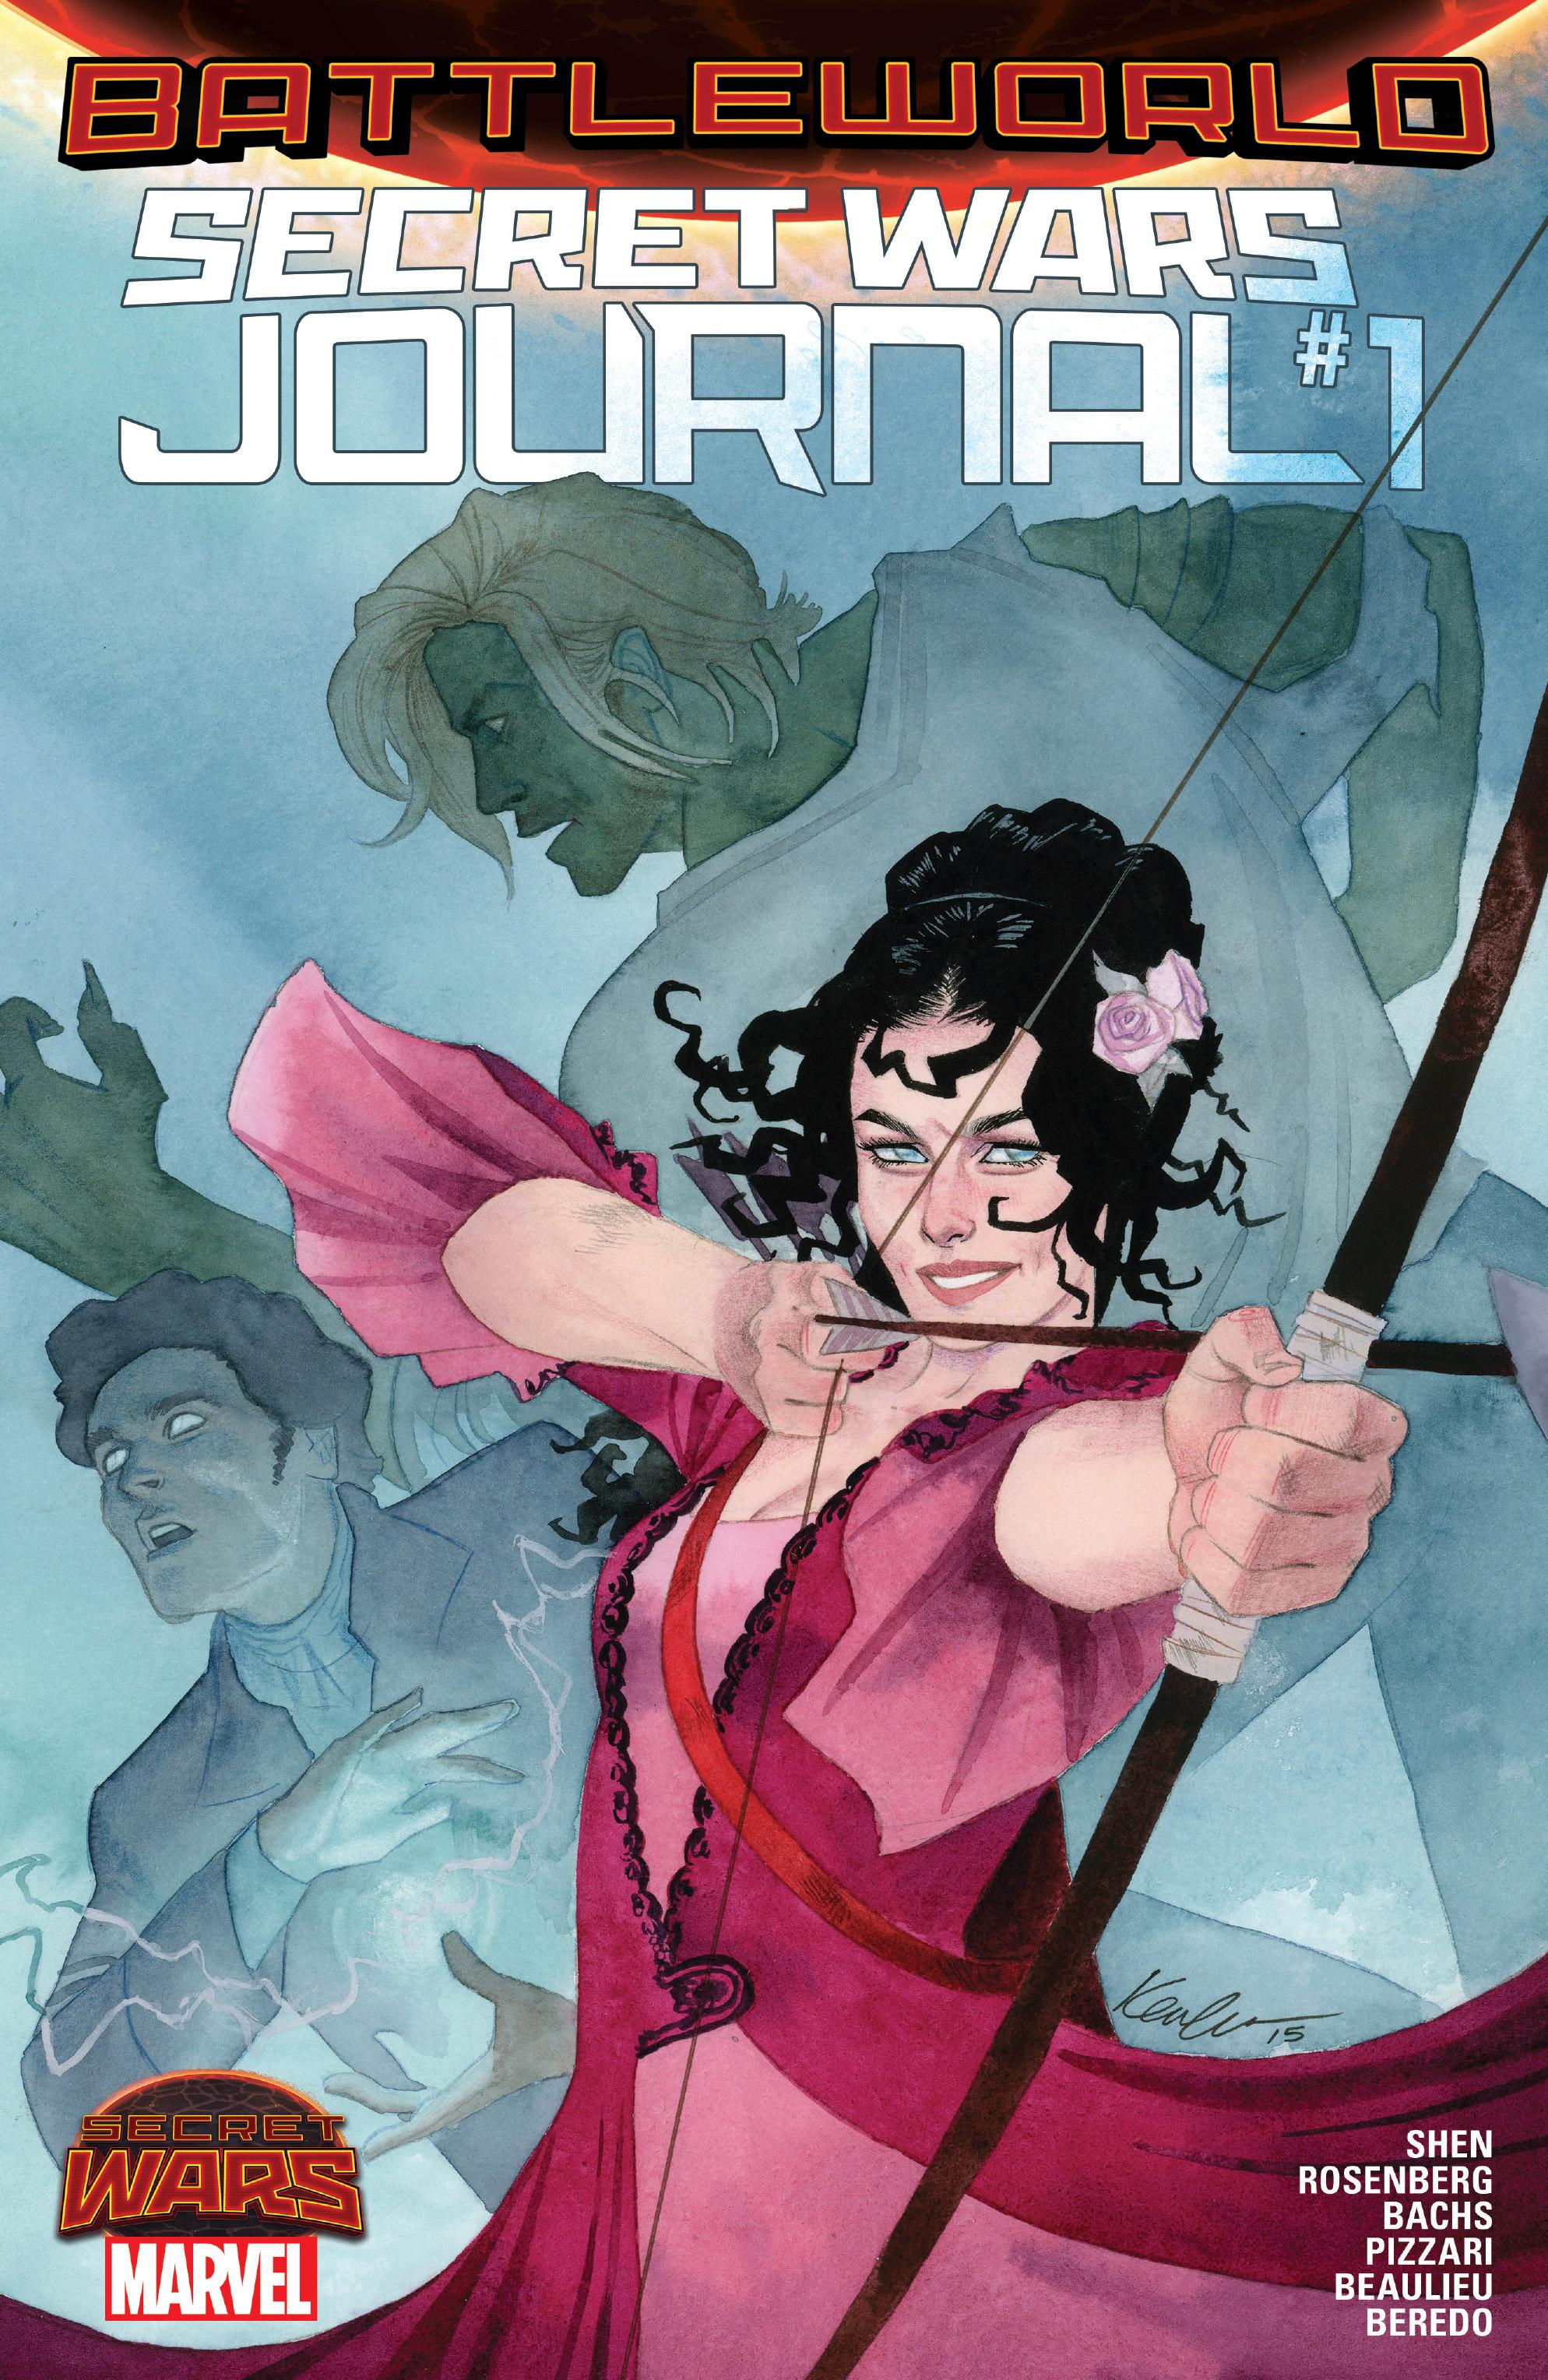 Read online Secret Wars Journal/Battleworld comic -  Issue # TPB - 4